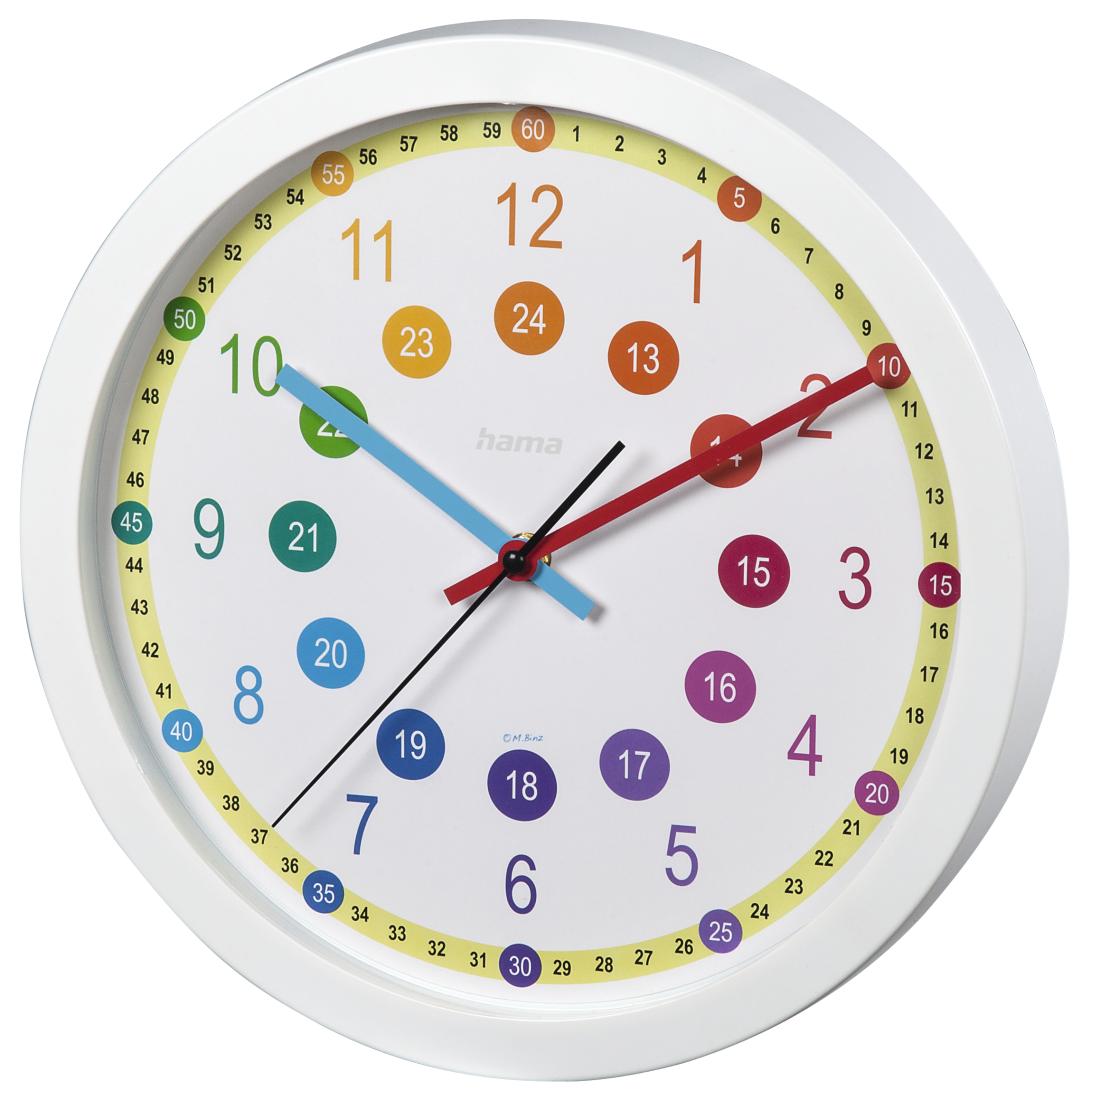 00176917 Hama Easy Learning Childrens Wall Clock Diameter 30 Cm